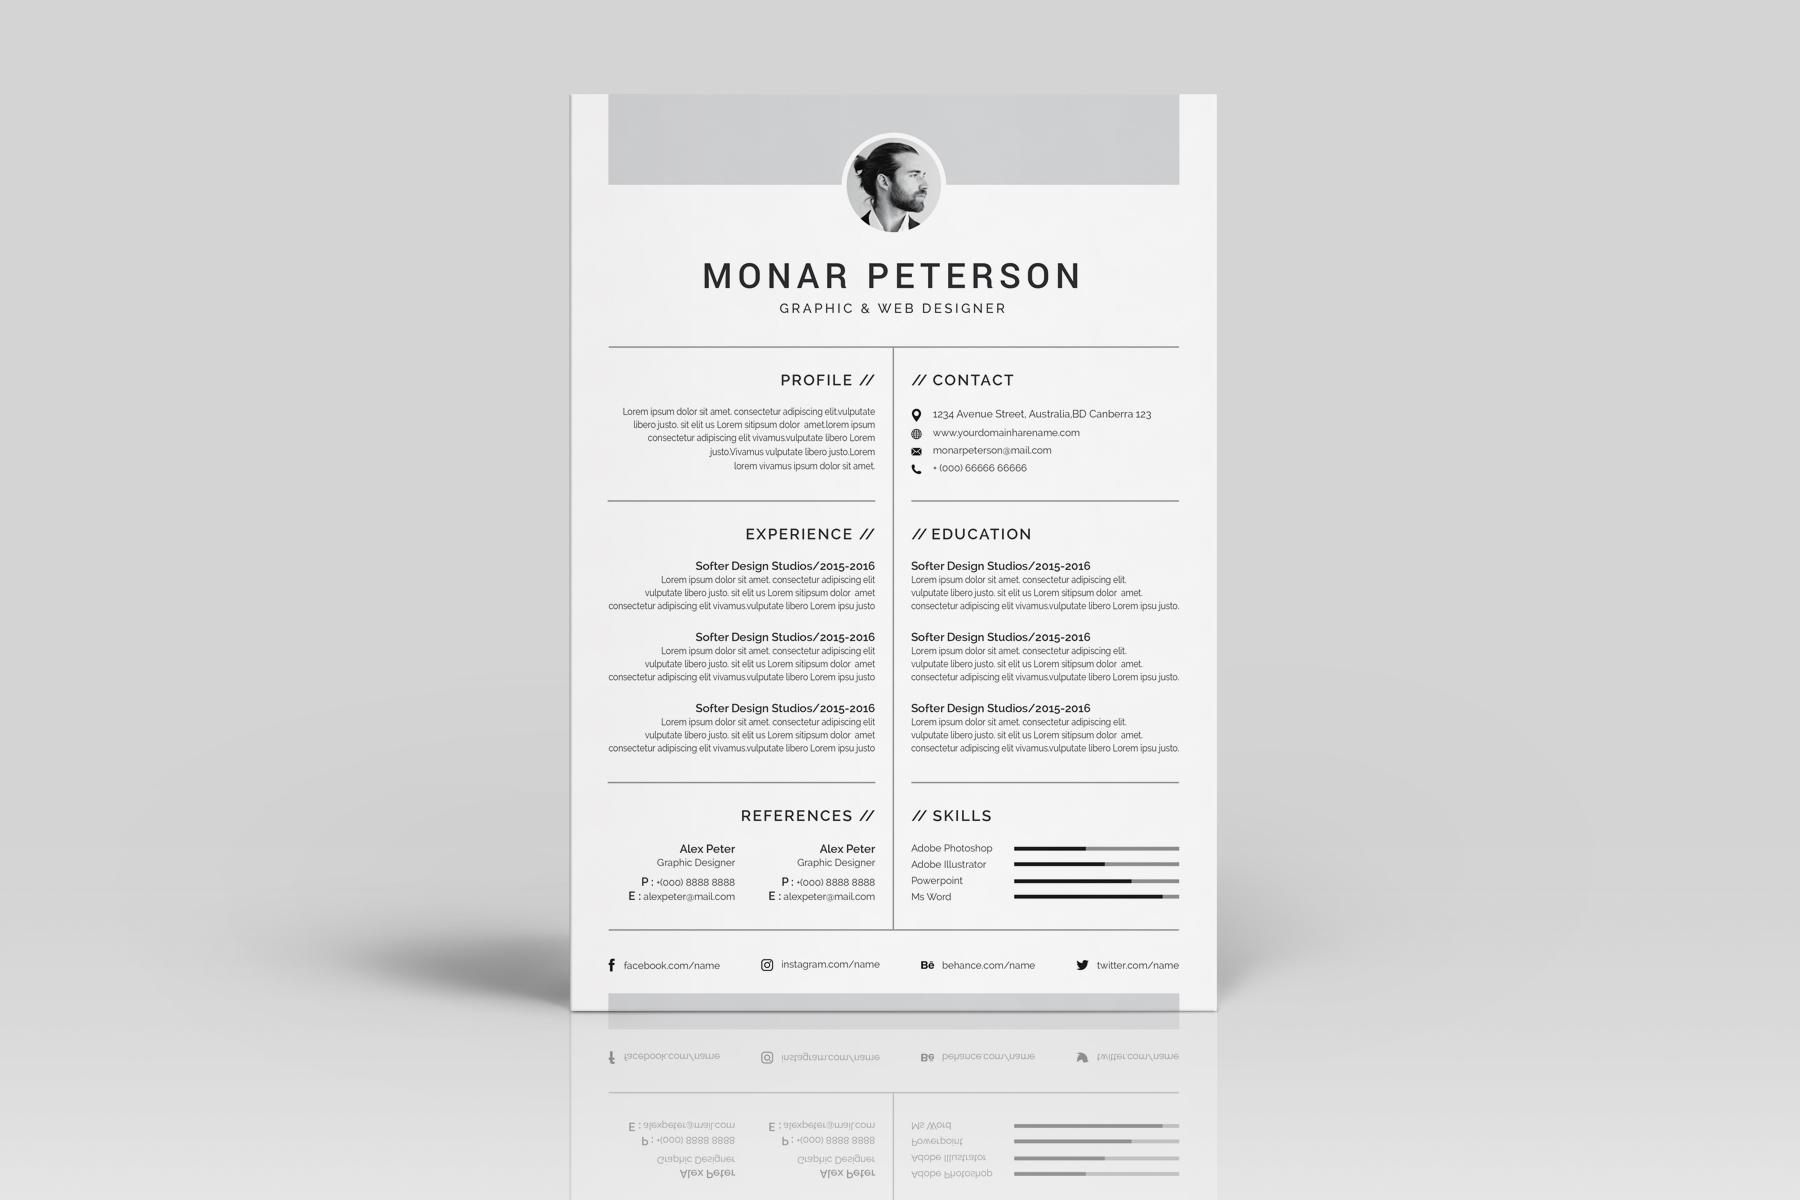 Luxusni Sablona Pro Zivotopis Monar Peterson 77208